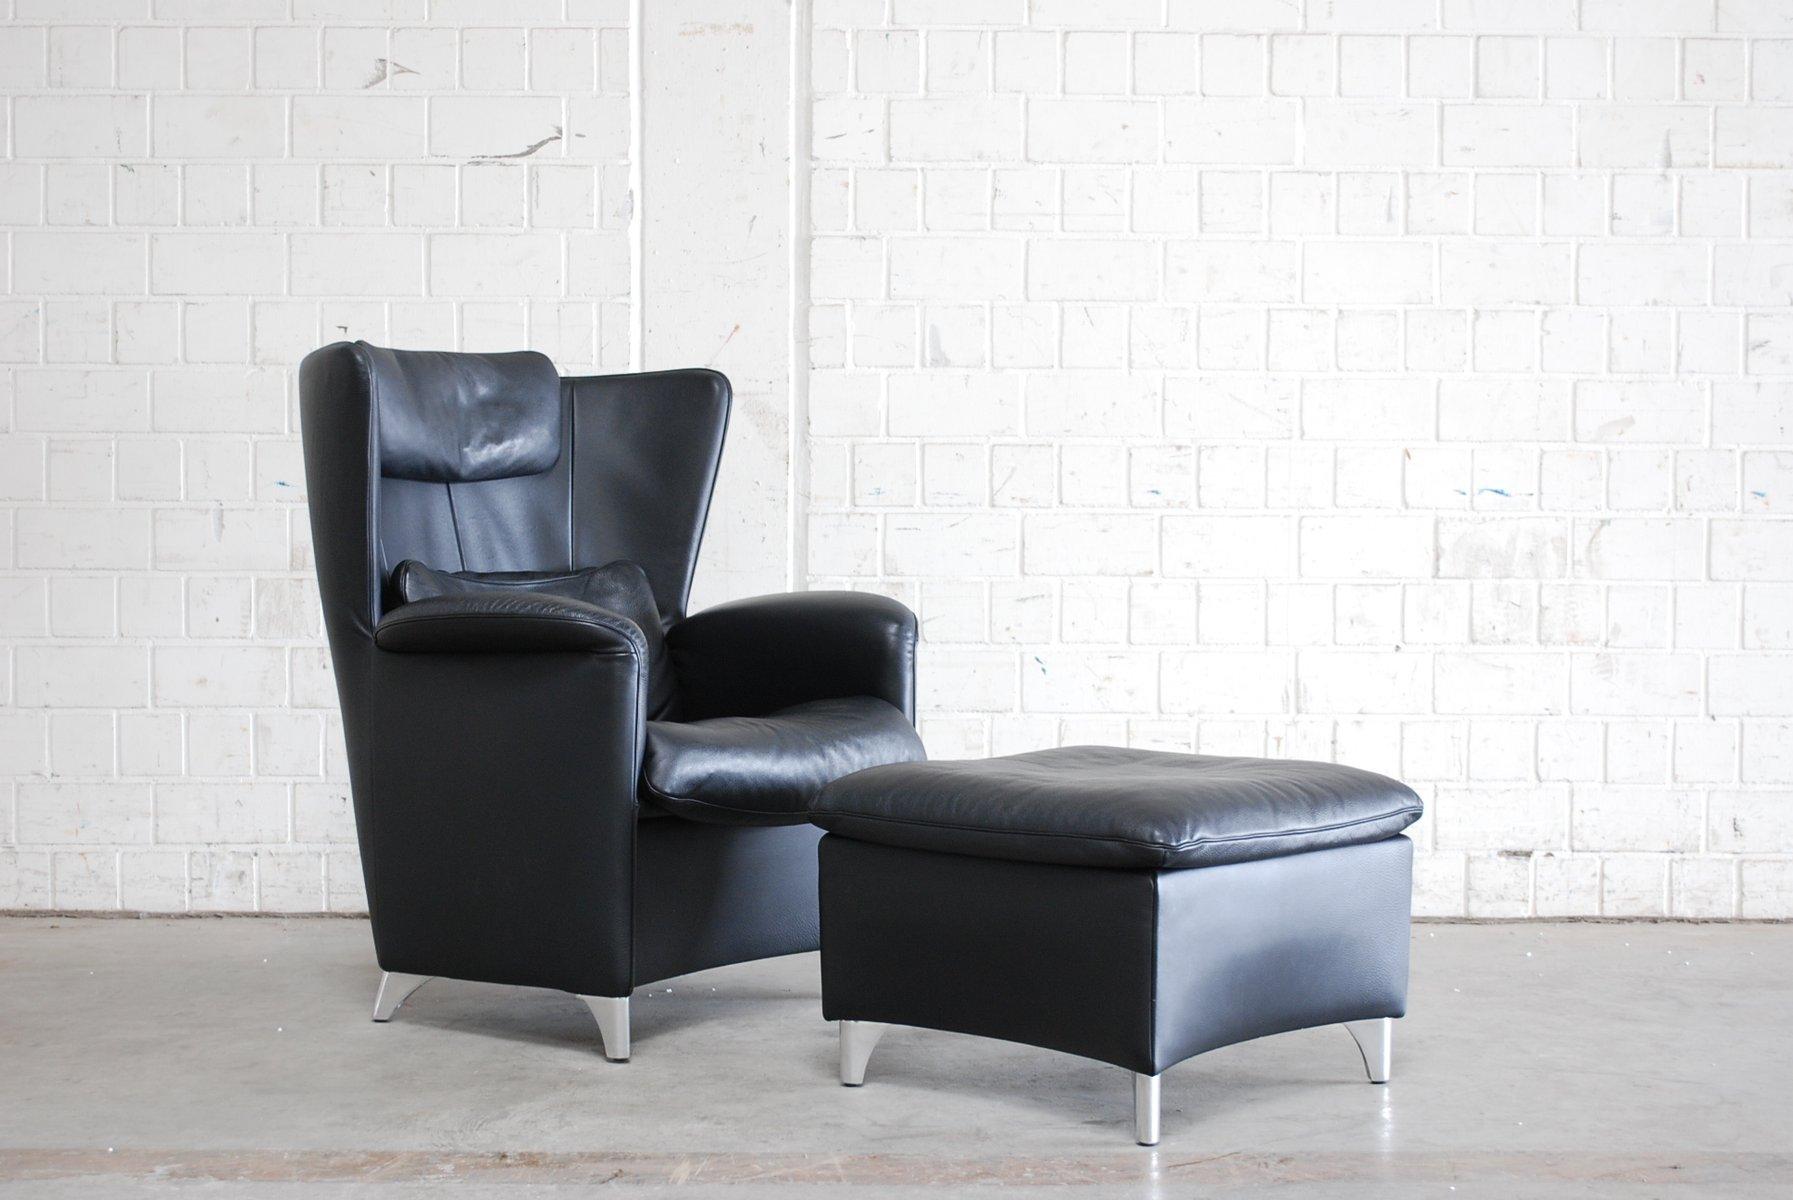 Black DS 23 Wingback Lounge Chair U0026 Ottoman By Franz Schulte For De Sede